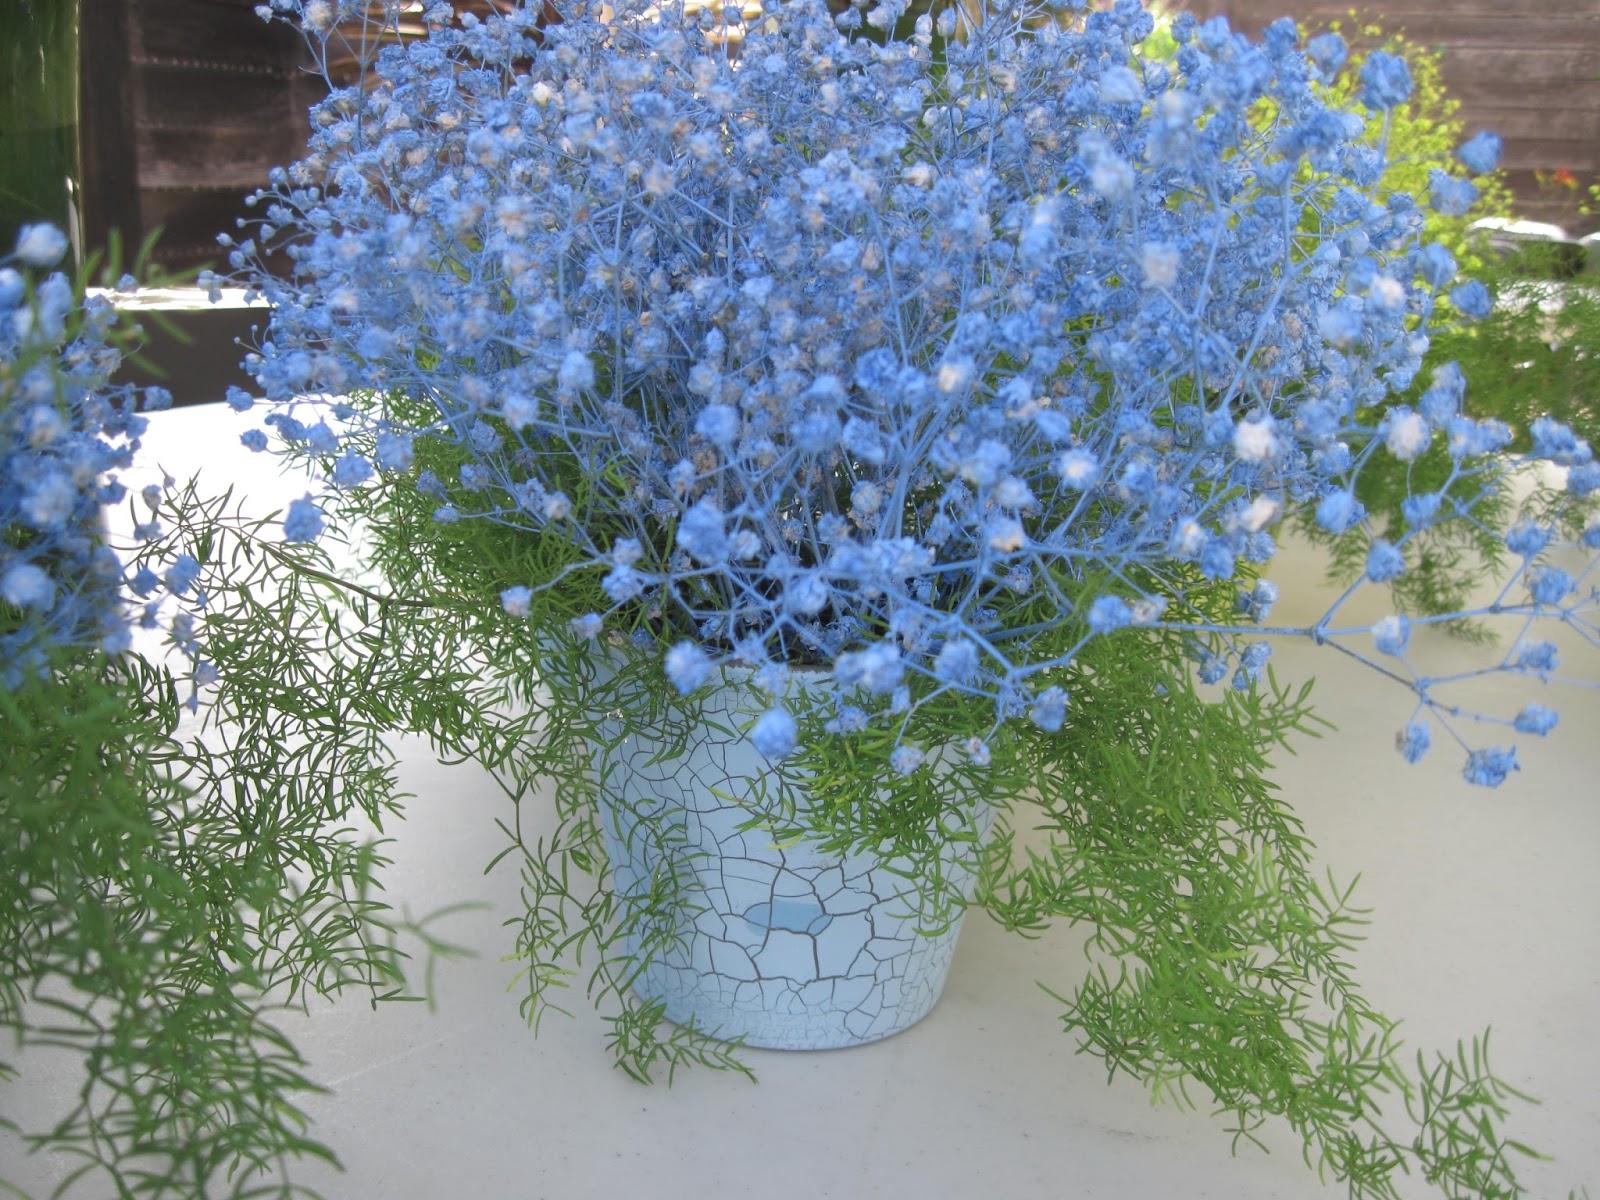 Blue Flowers For Floral Arrangements 13 Desktop Wallpaper